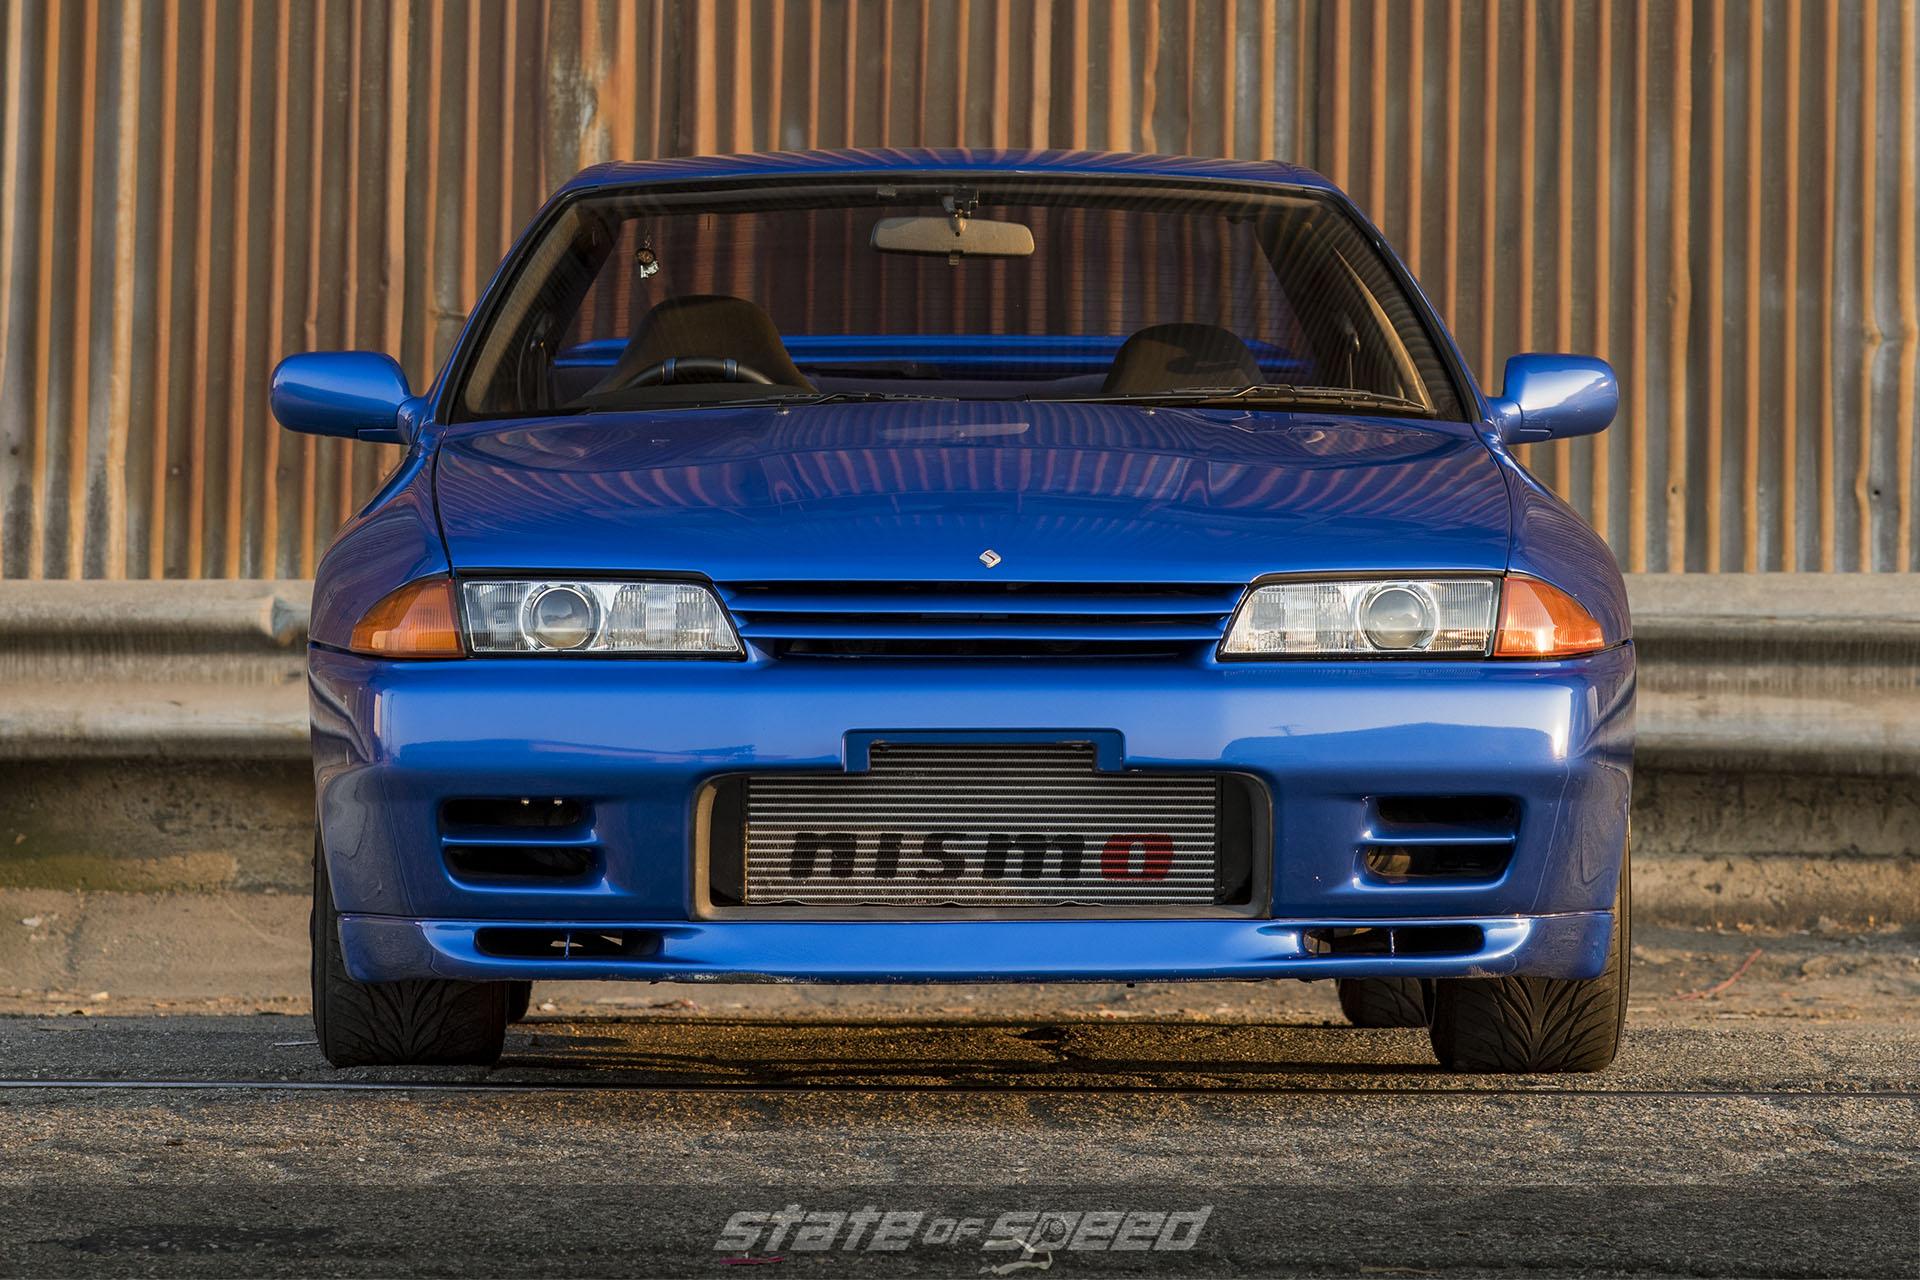 Nissan GTR R32 Skyline